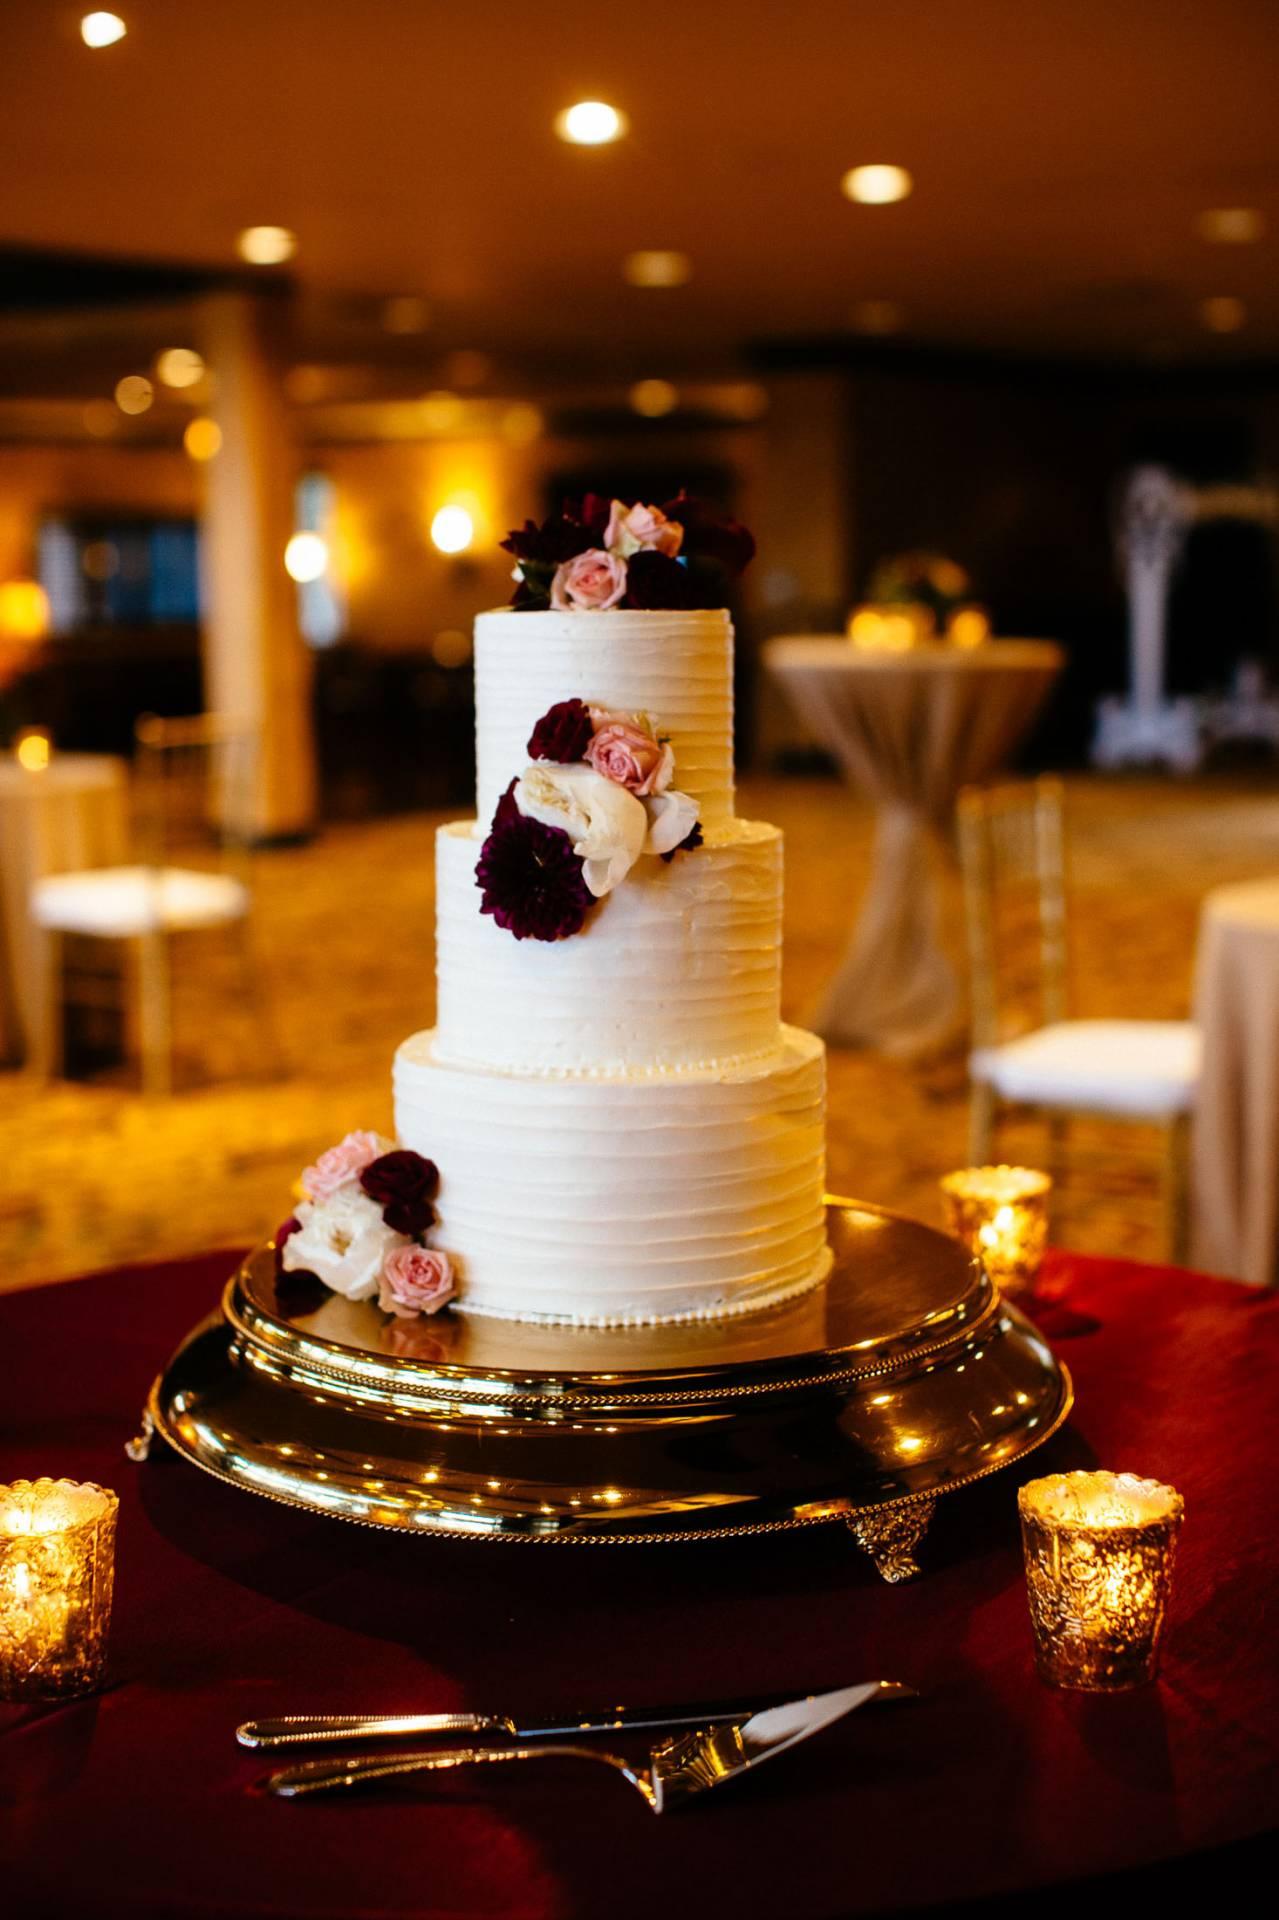 Three-tiered wedding cake at the Cheyenne Lodge.